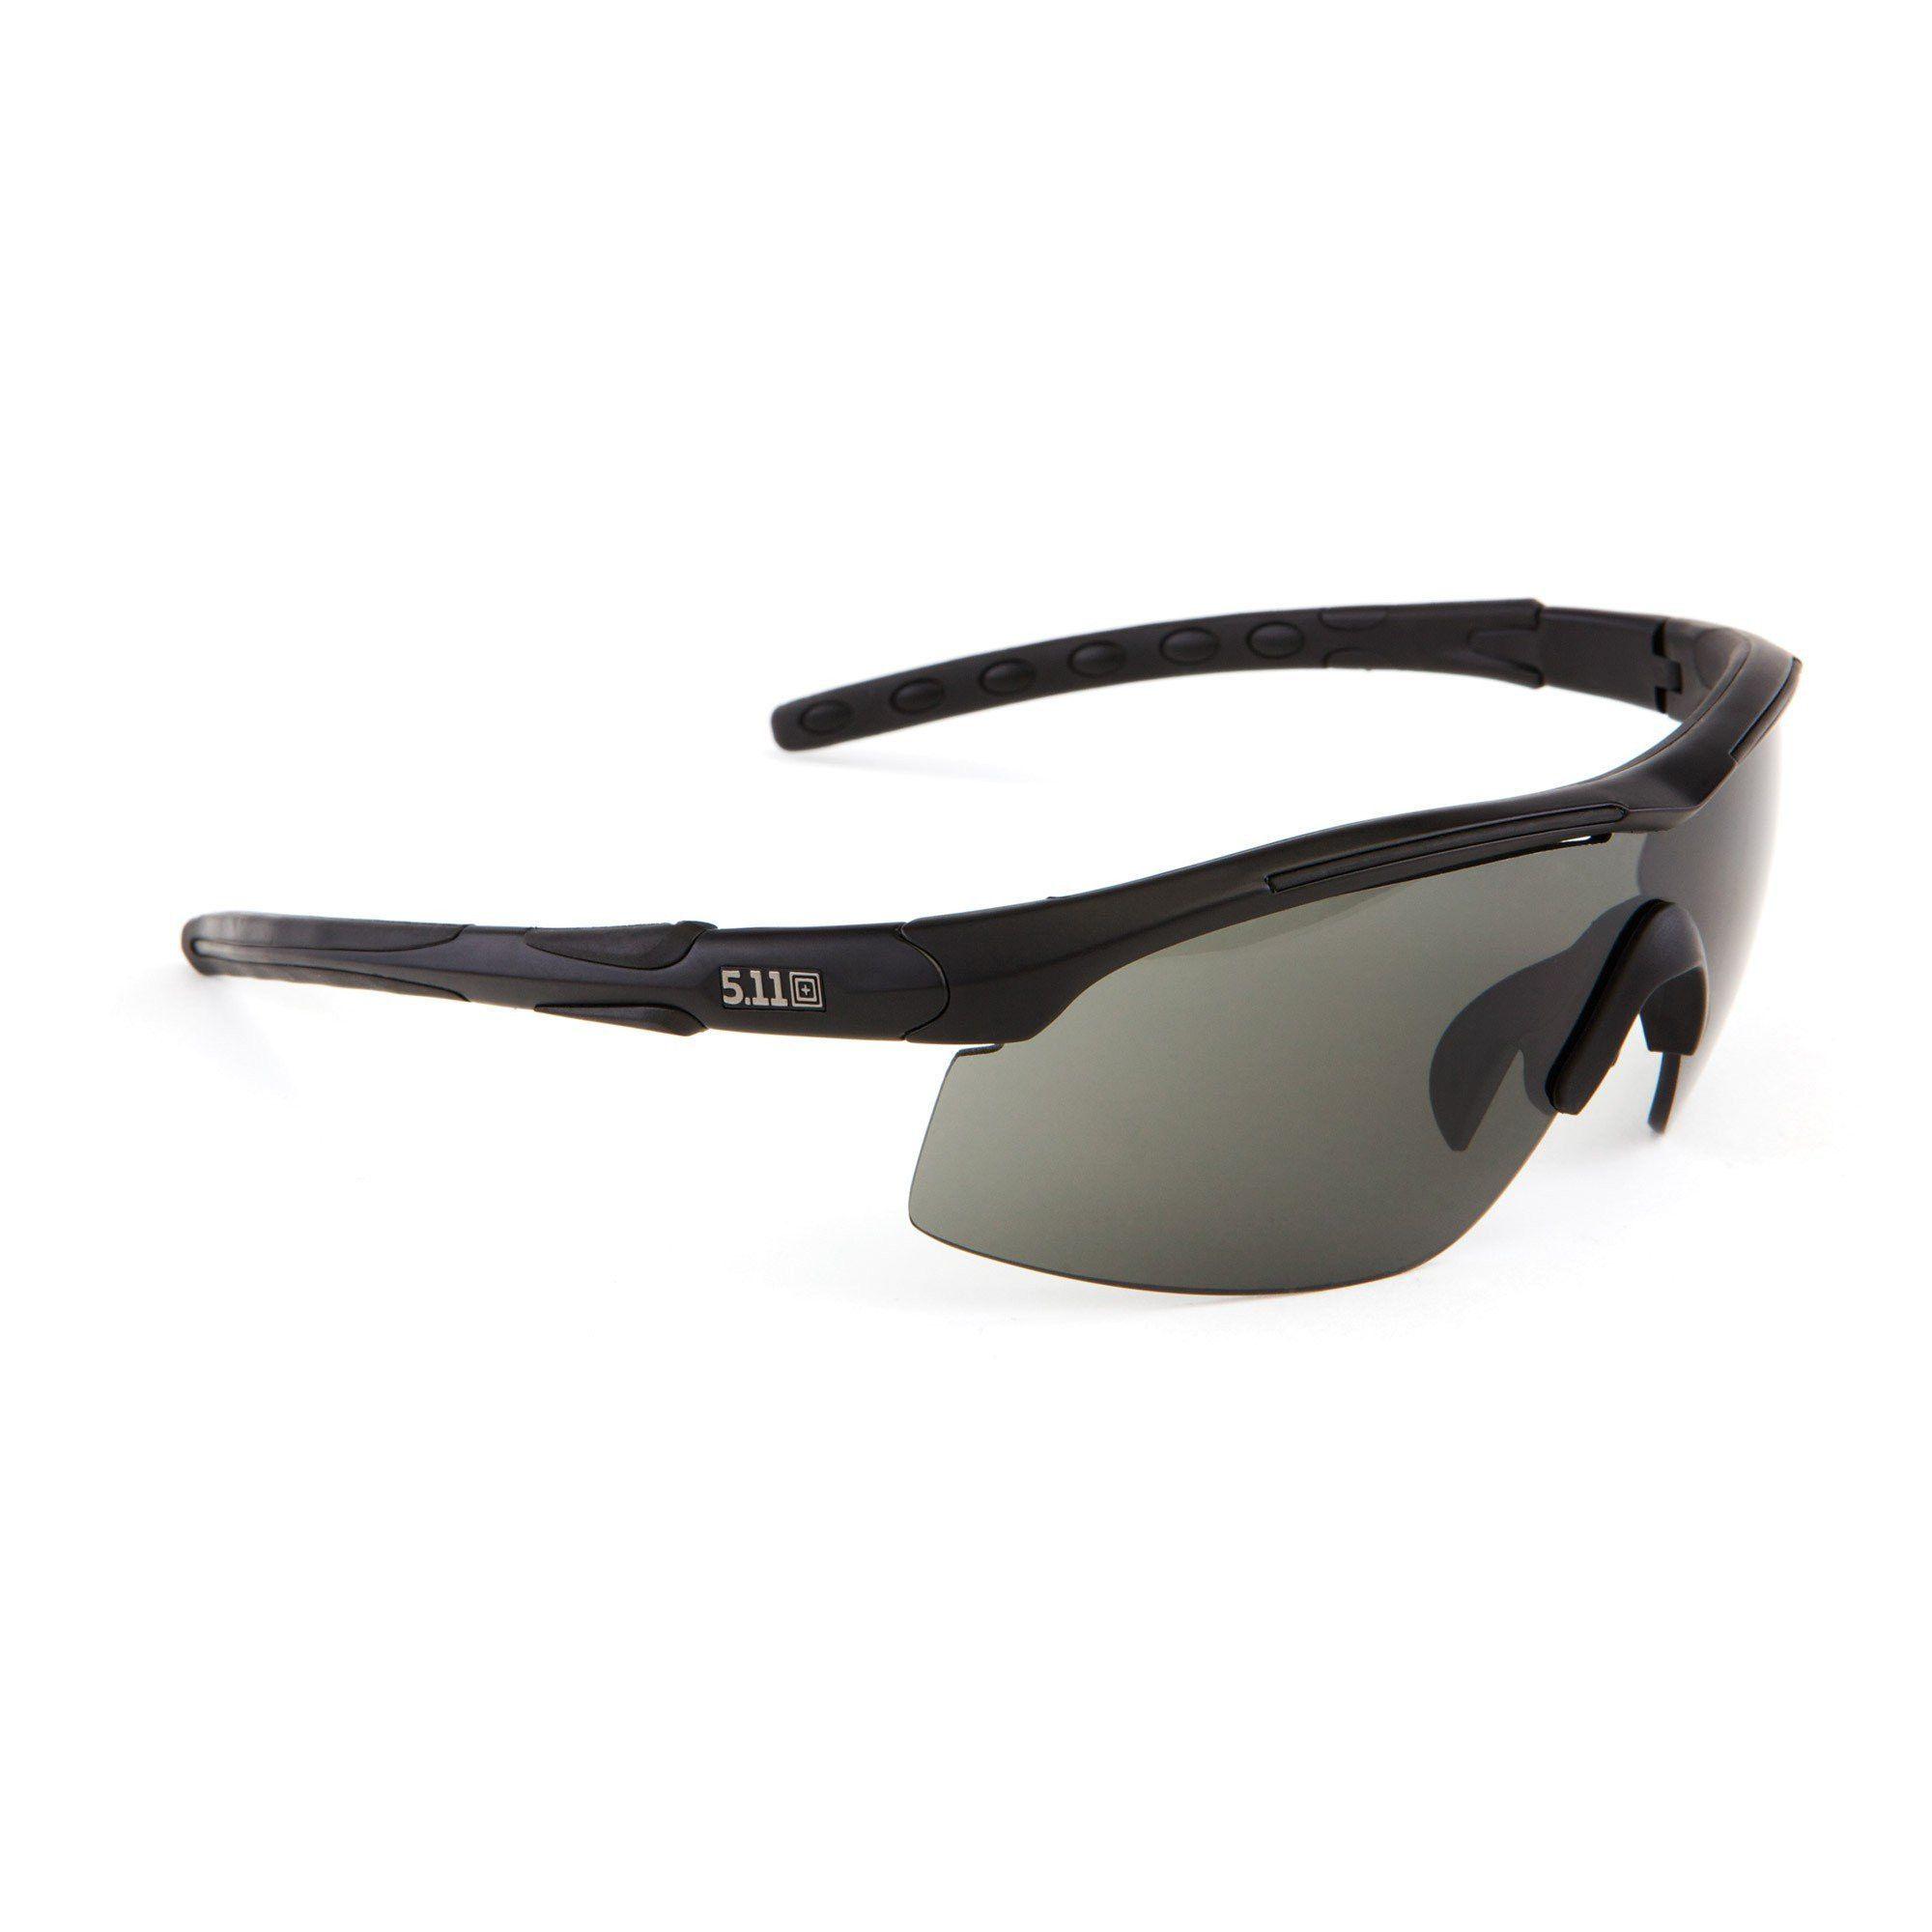 511 tactical raid sunglasses sunglasses sunglasses